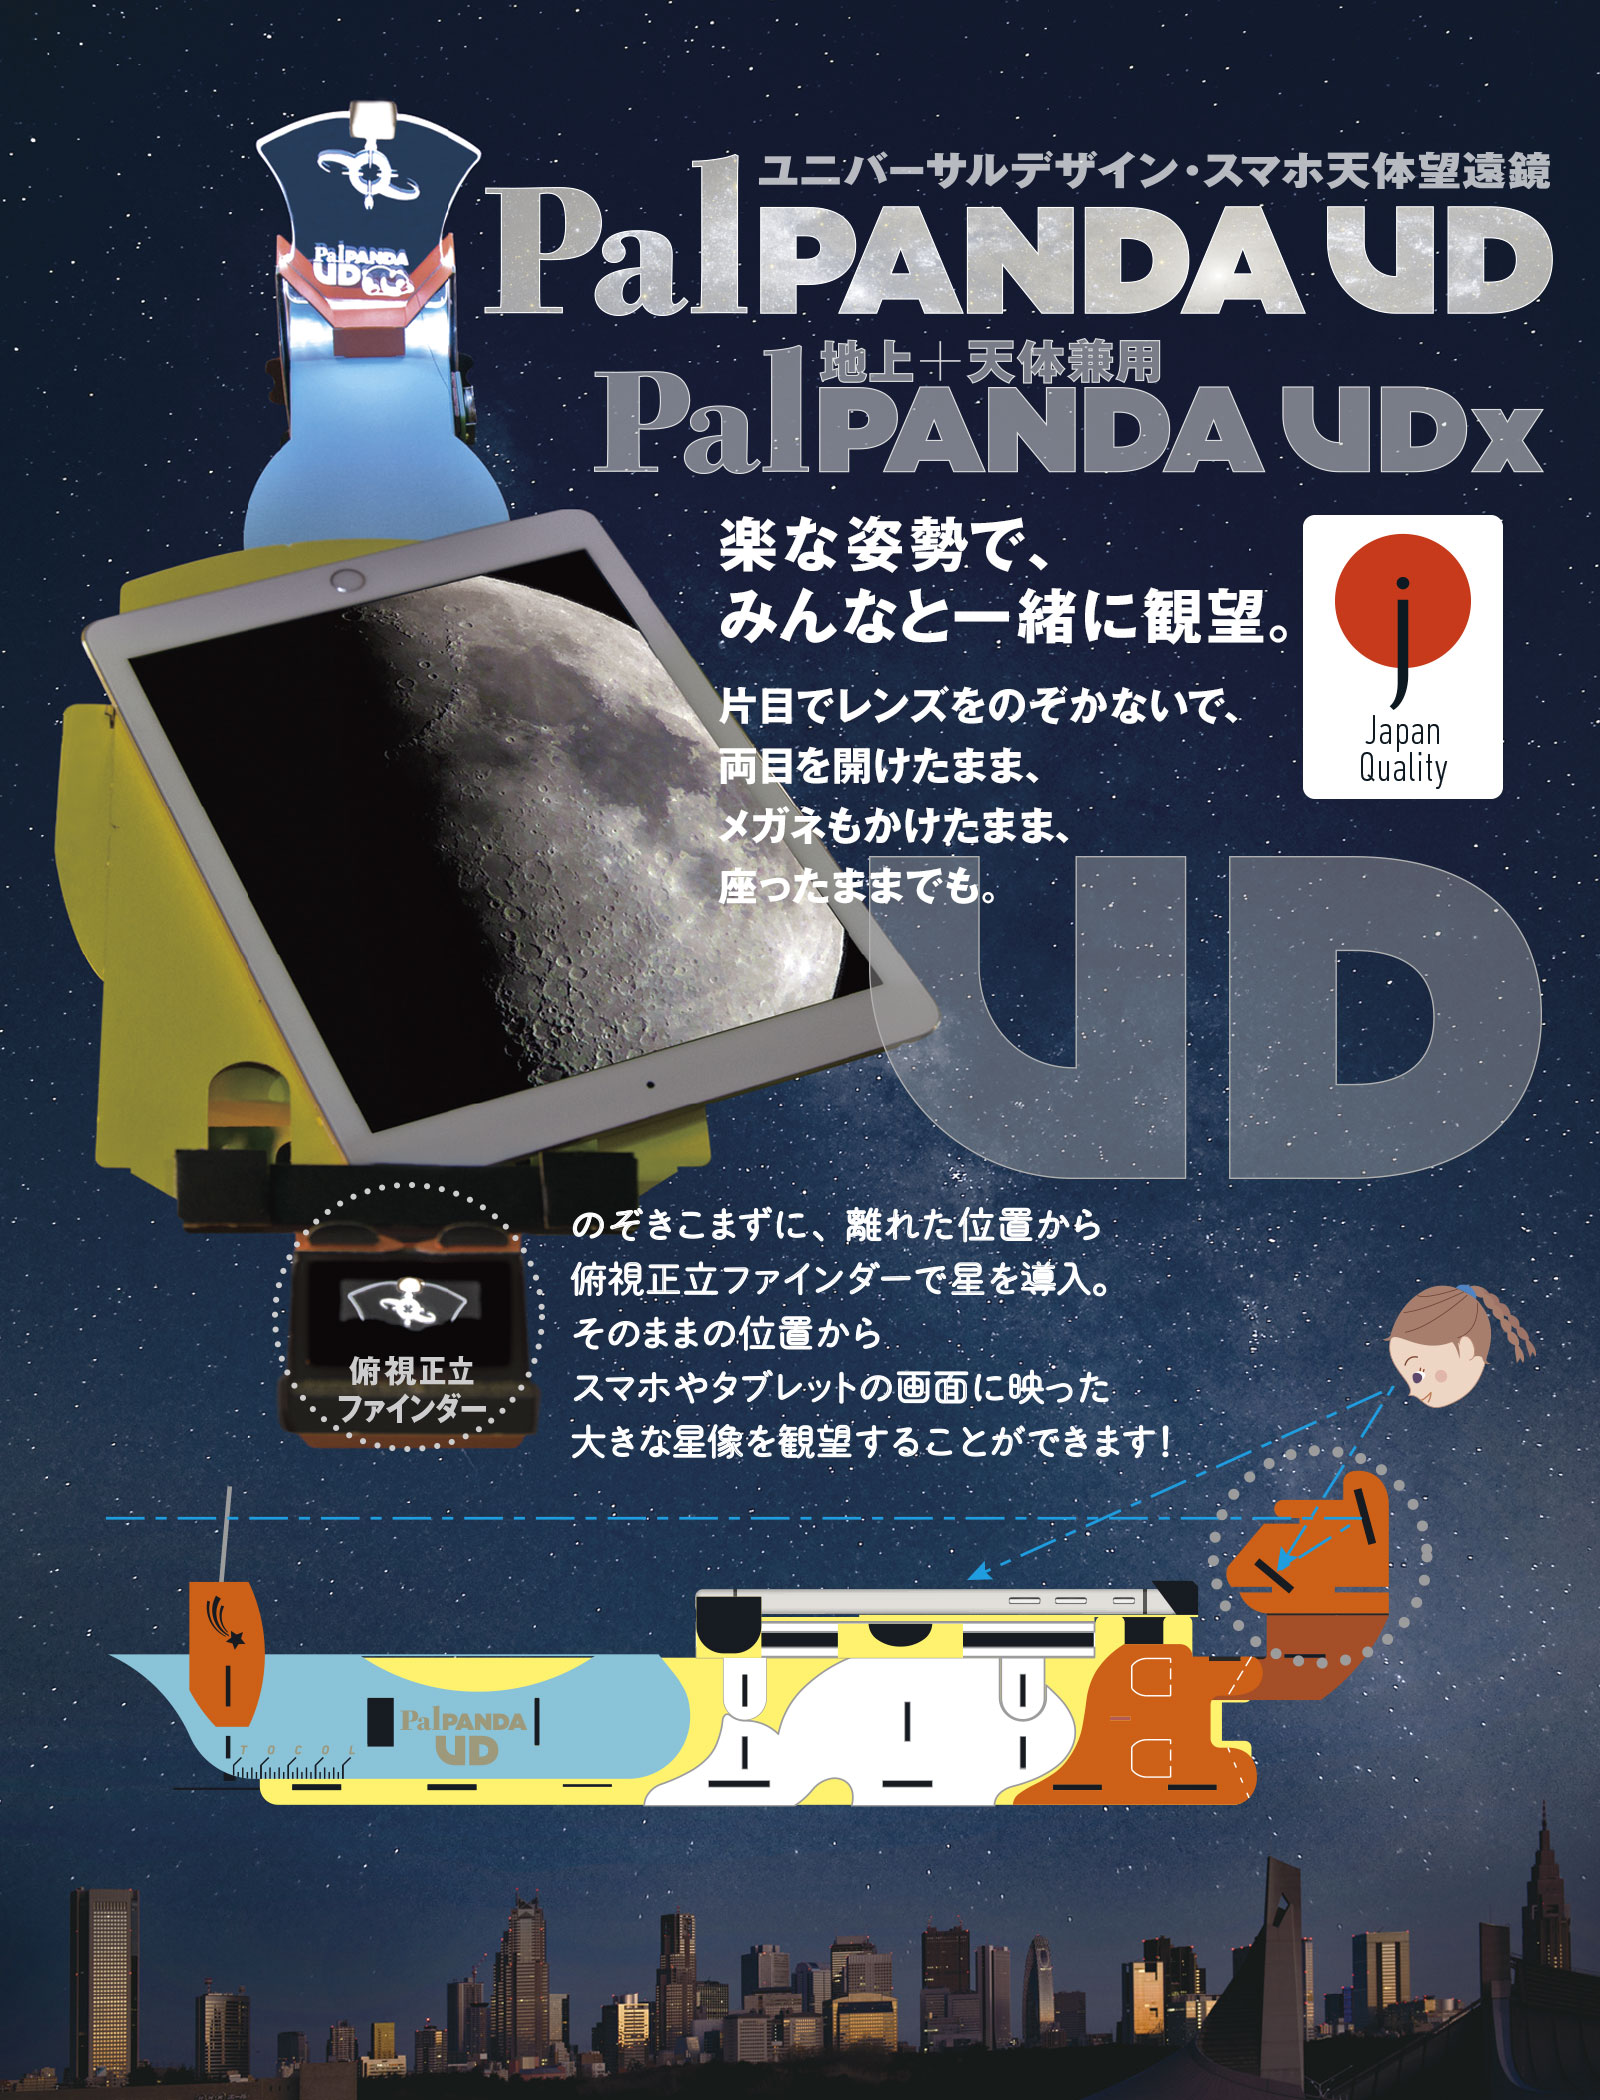 TOCOLの「ユニバーサルデザイン・スマホ天体望遠鏡PalPANDA UD」